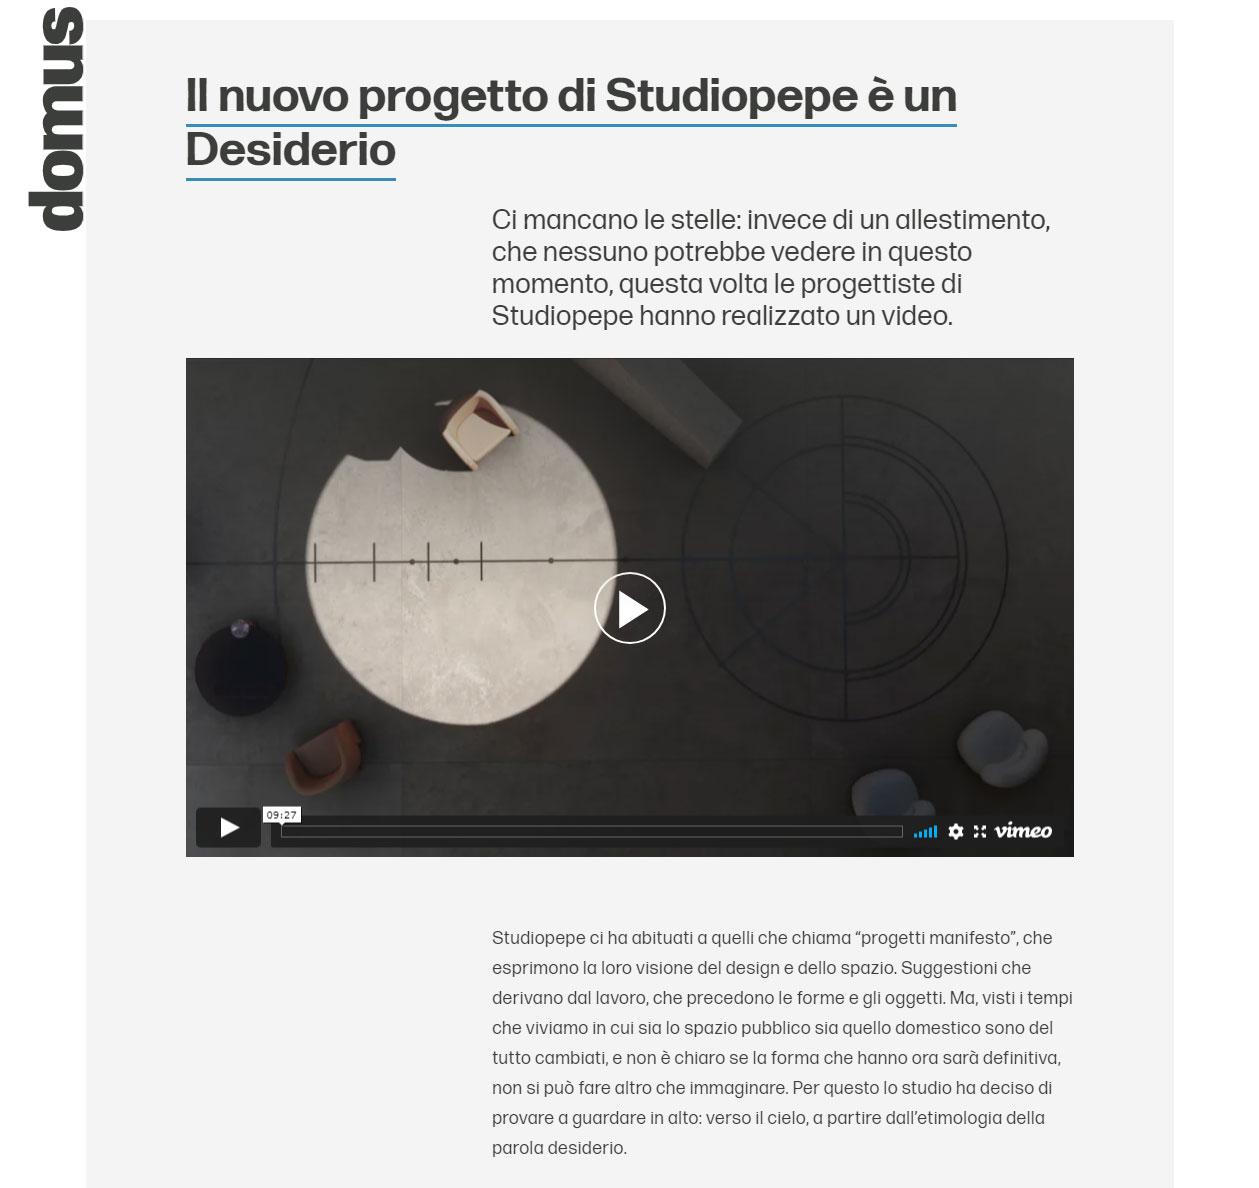 De-siderio Studiopepe project/ TerzoPiano 3dArt